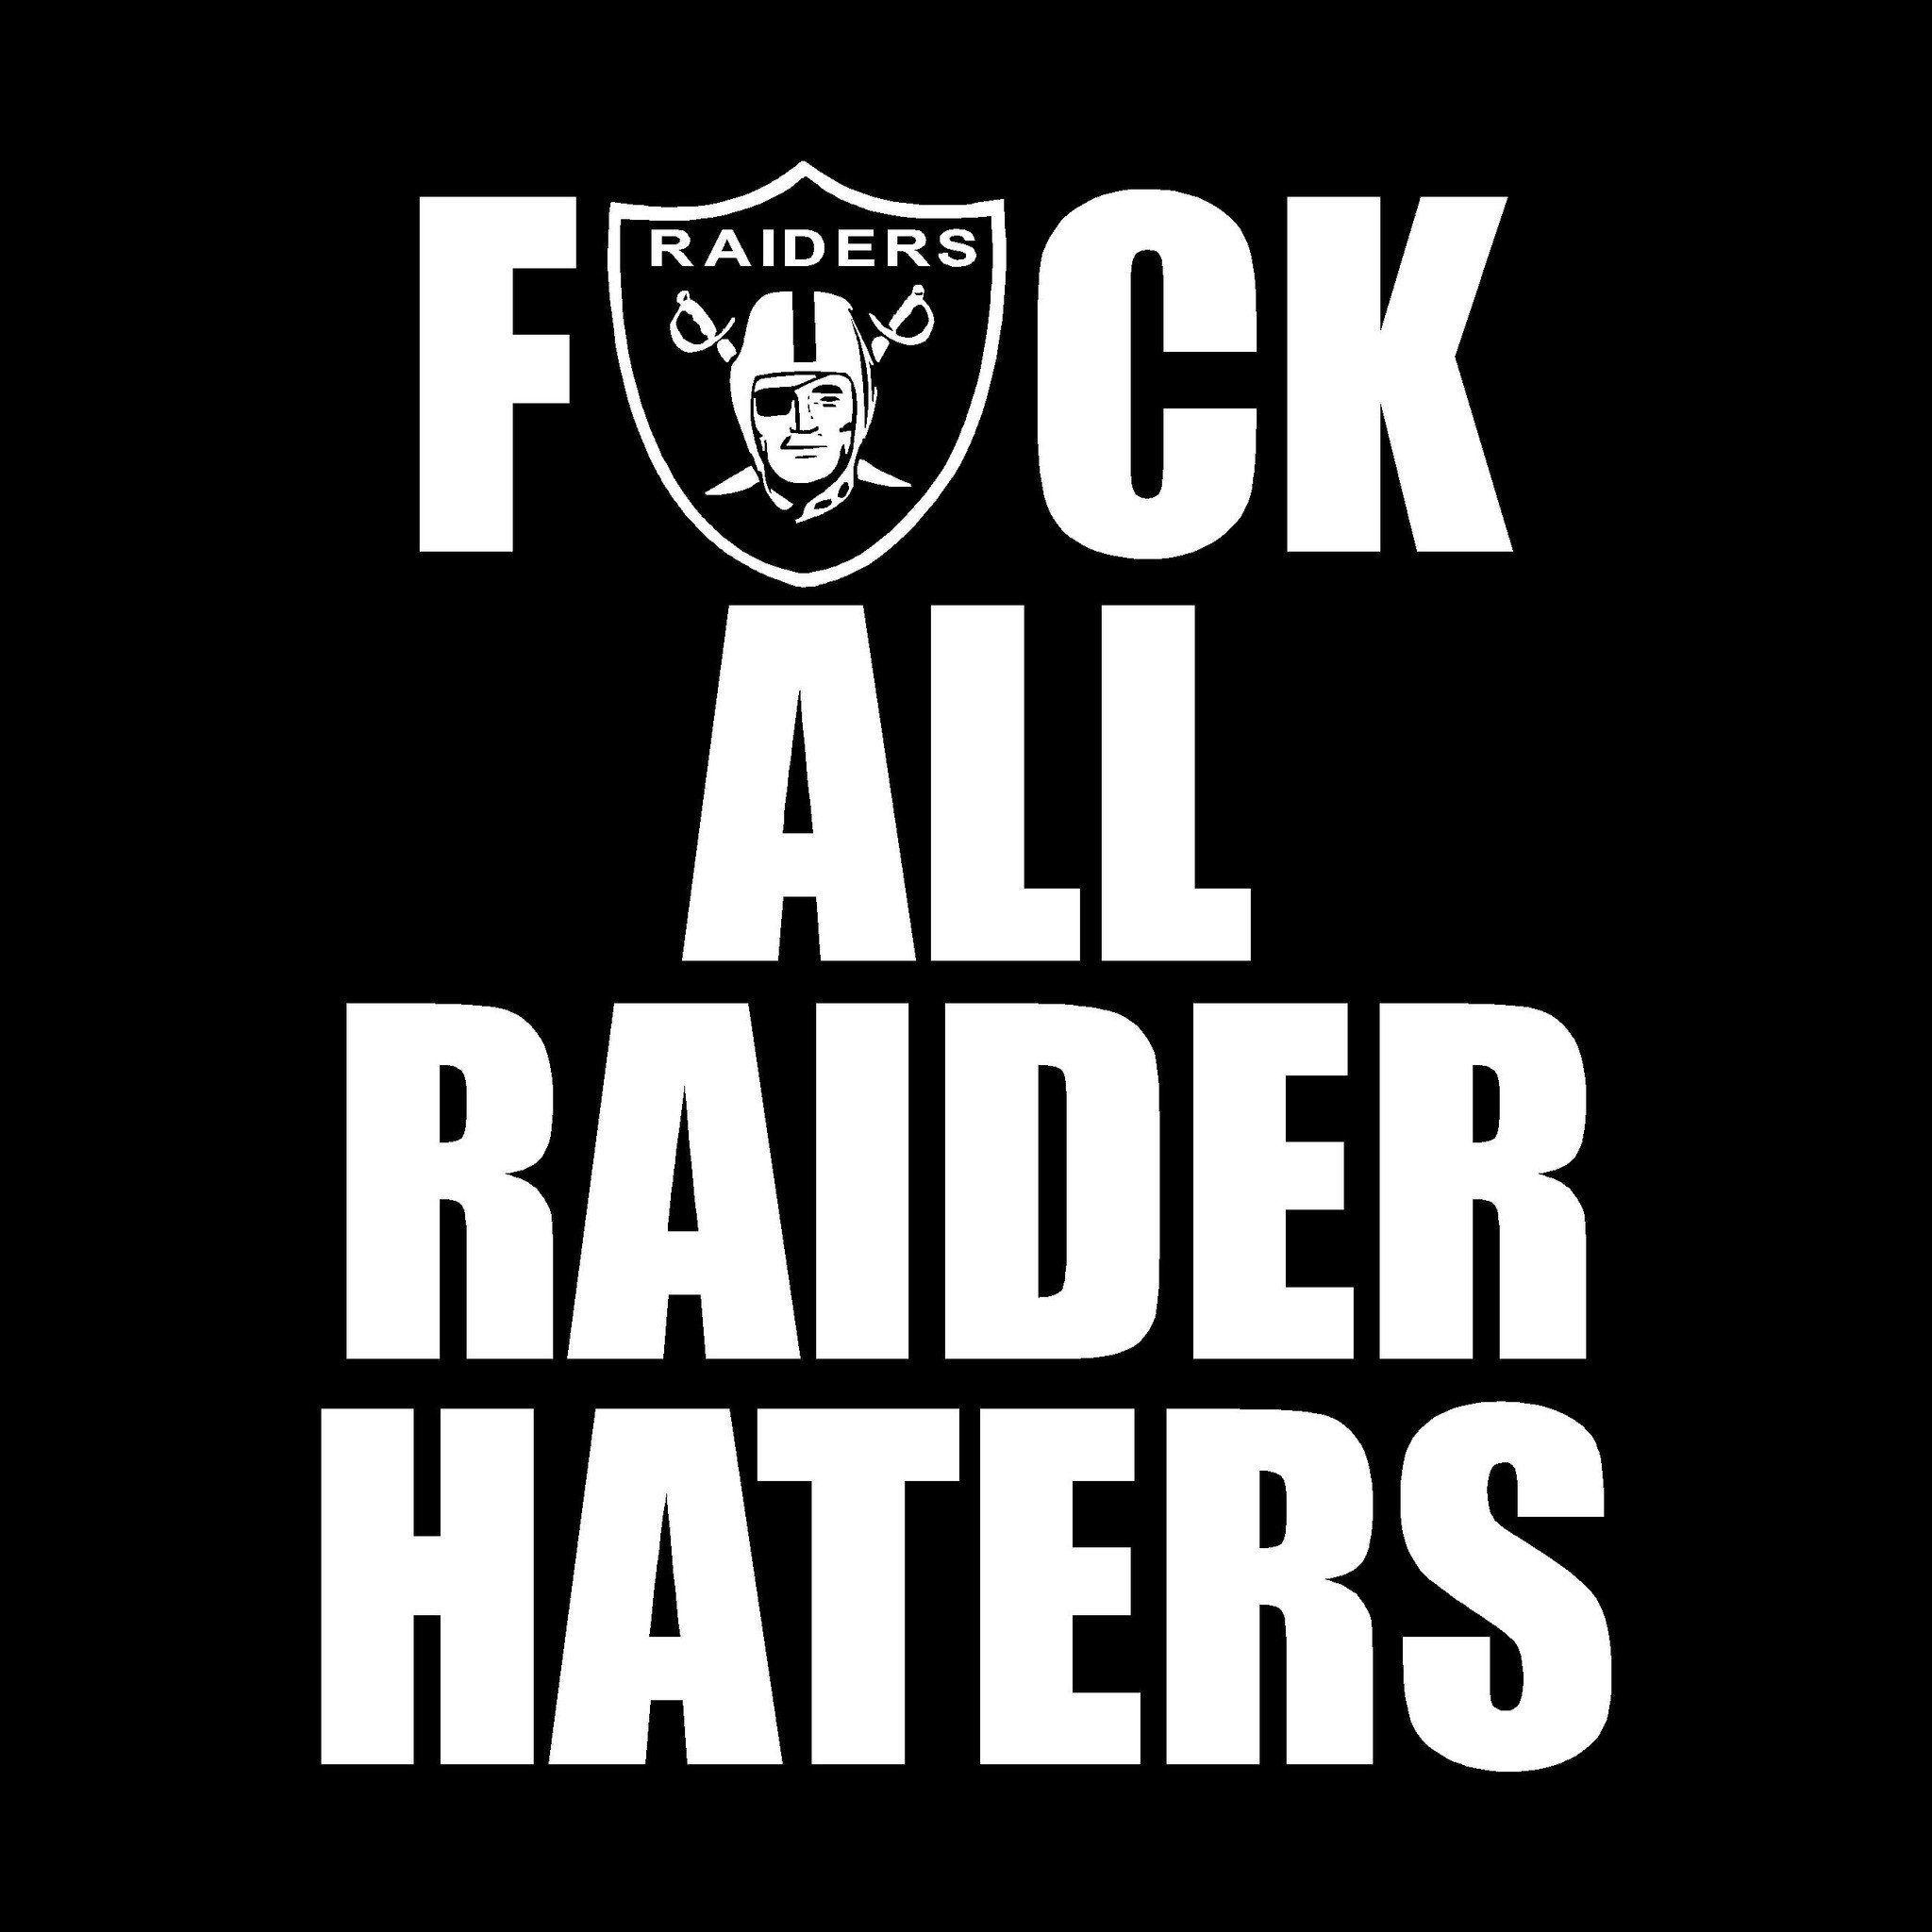 Raiders Haters